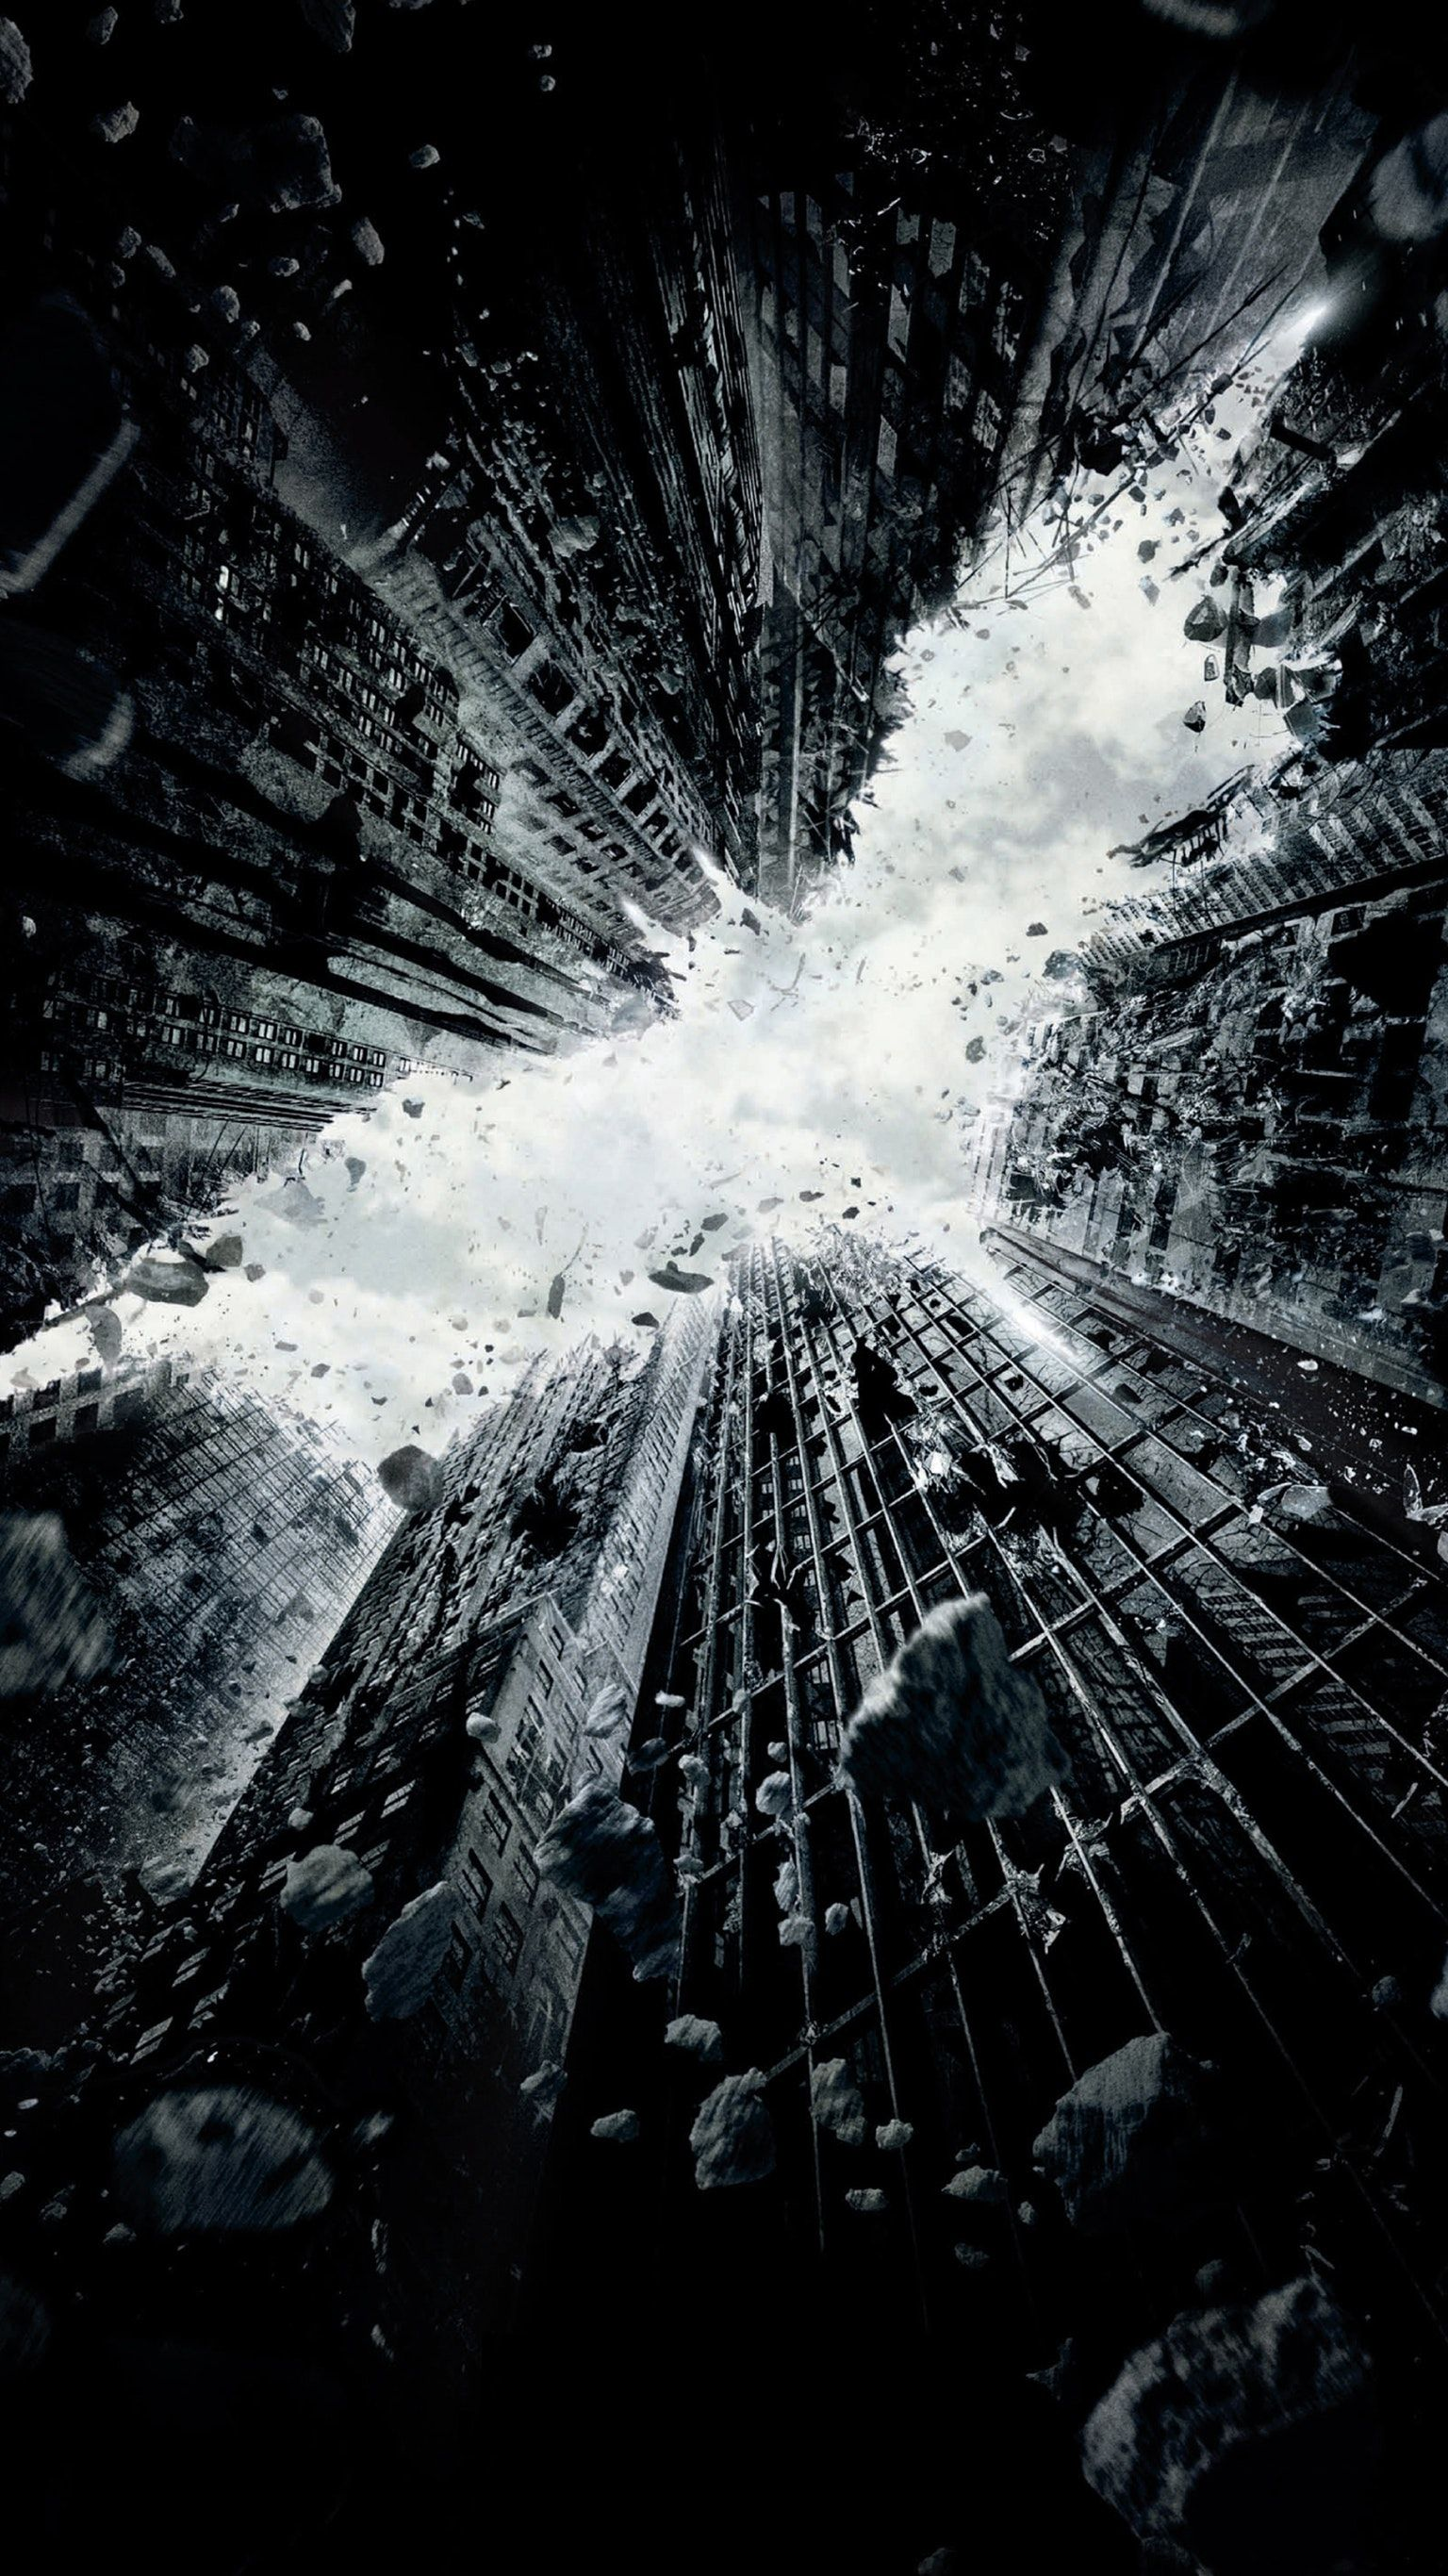 The Dark Knight Rises 2012 Phone Wallpaper Moviemania Dark Knight Wallpaper Batman The Dark Knight The Dark Knight Trilogy Batman dark knight logo wallpaper hd